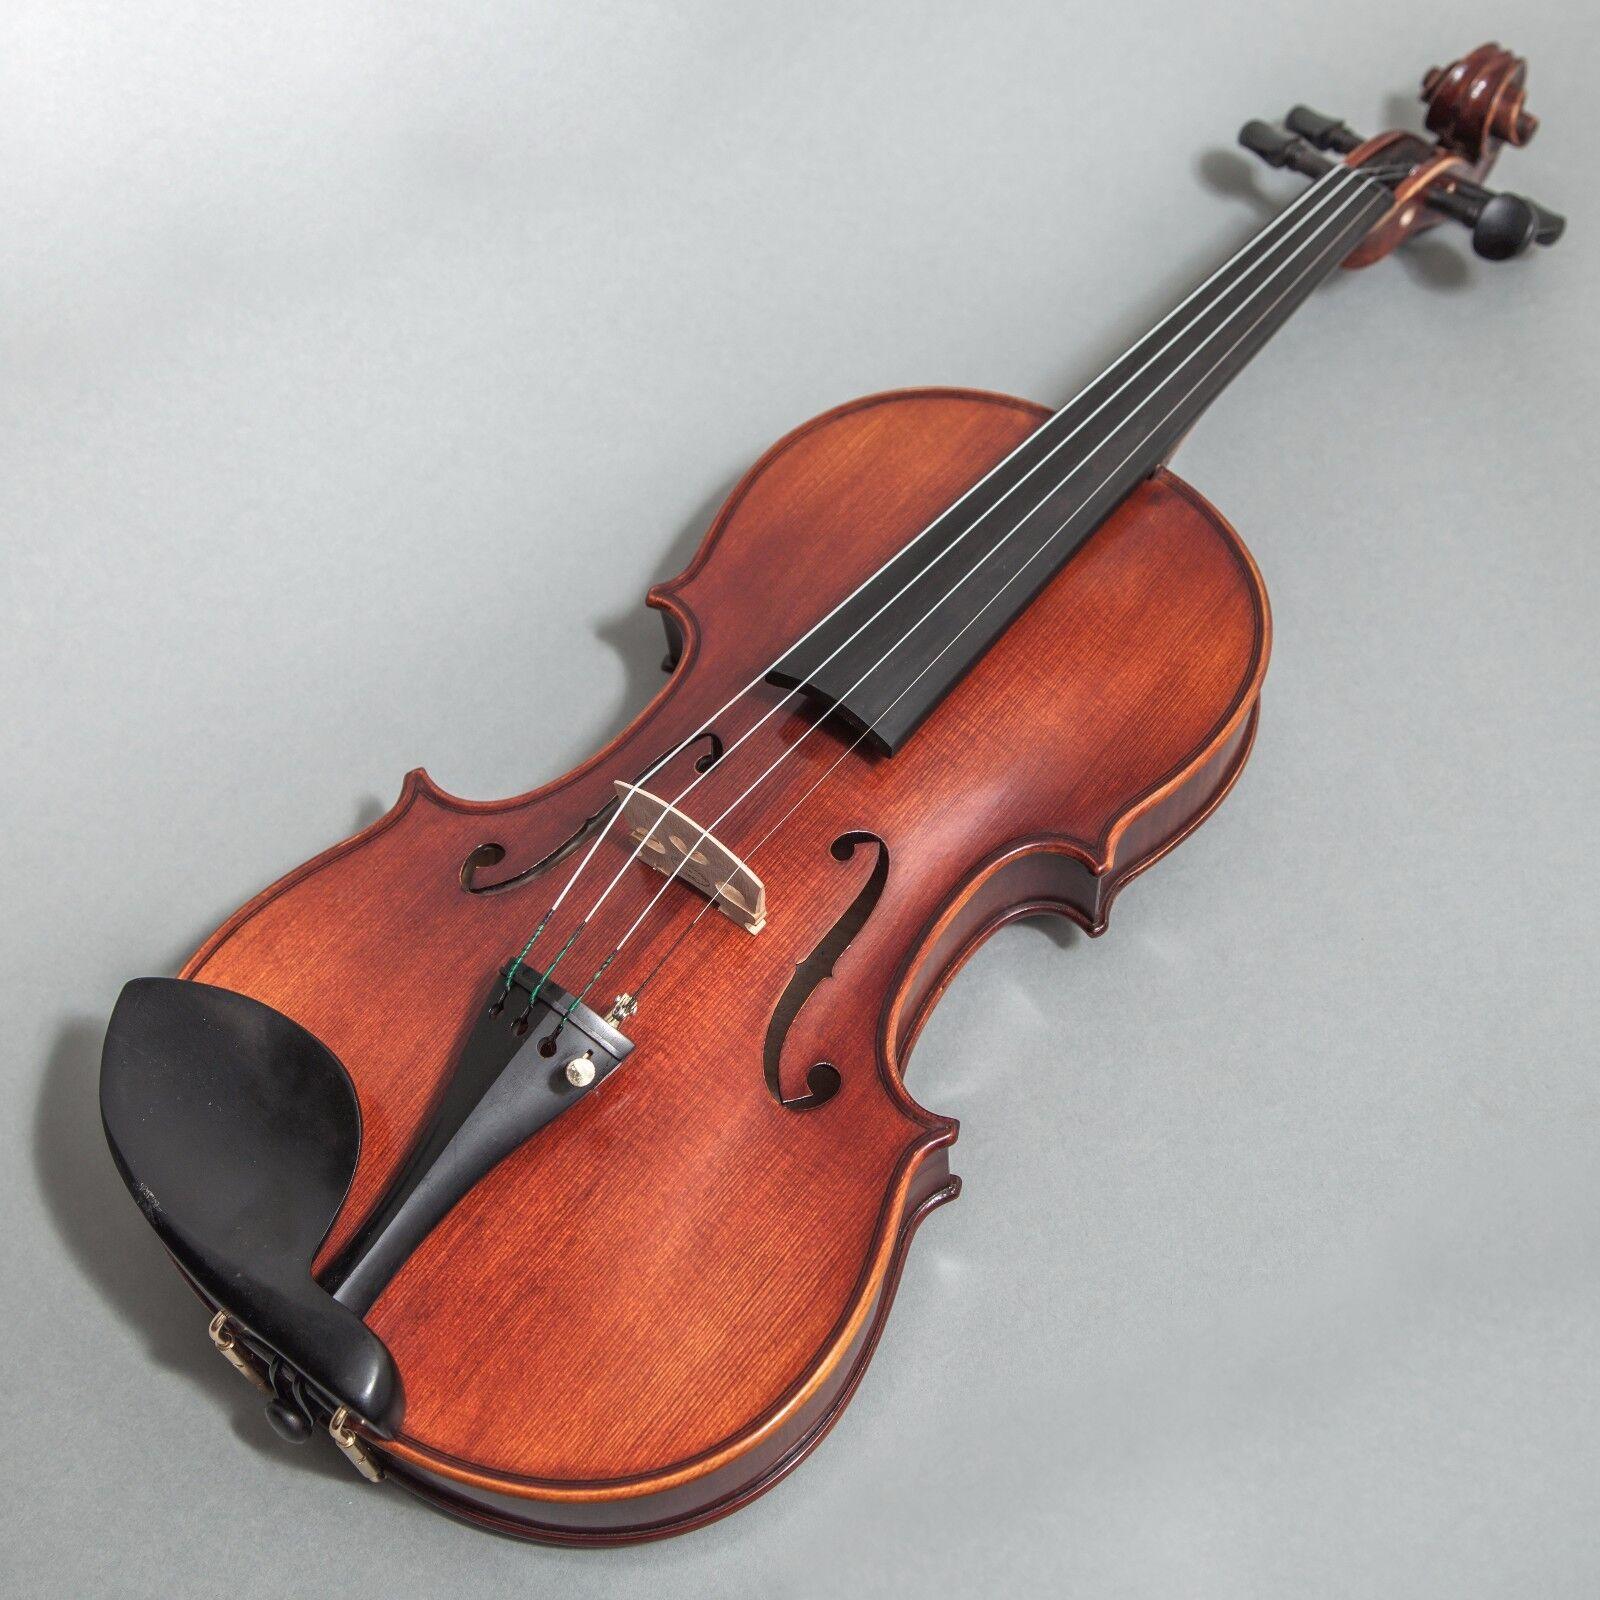 Sky FL001-GX Hand Made Professional 4 4 Full storlek Violin Ebony Fitted